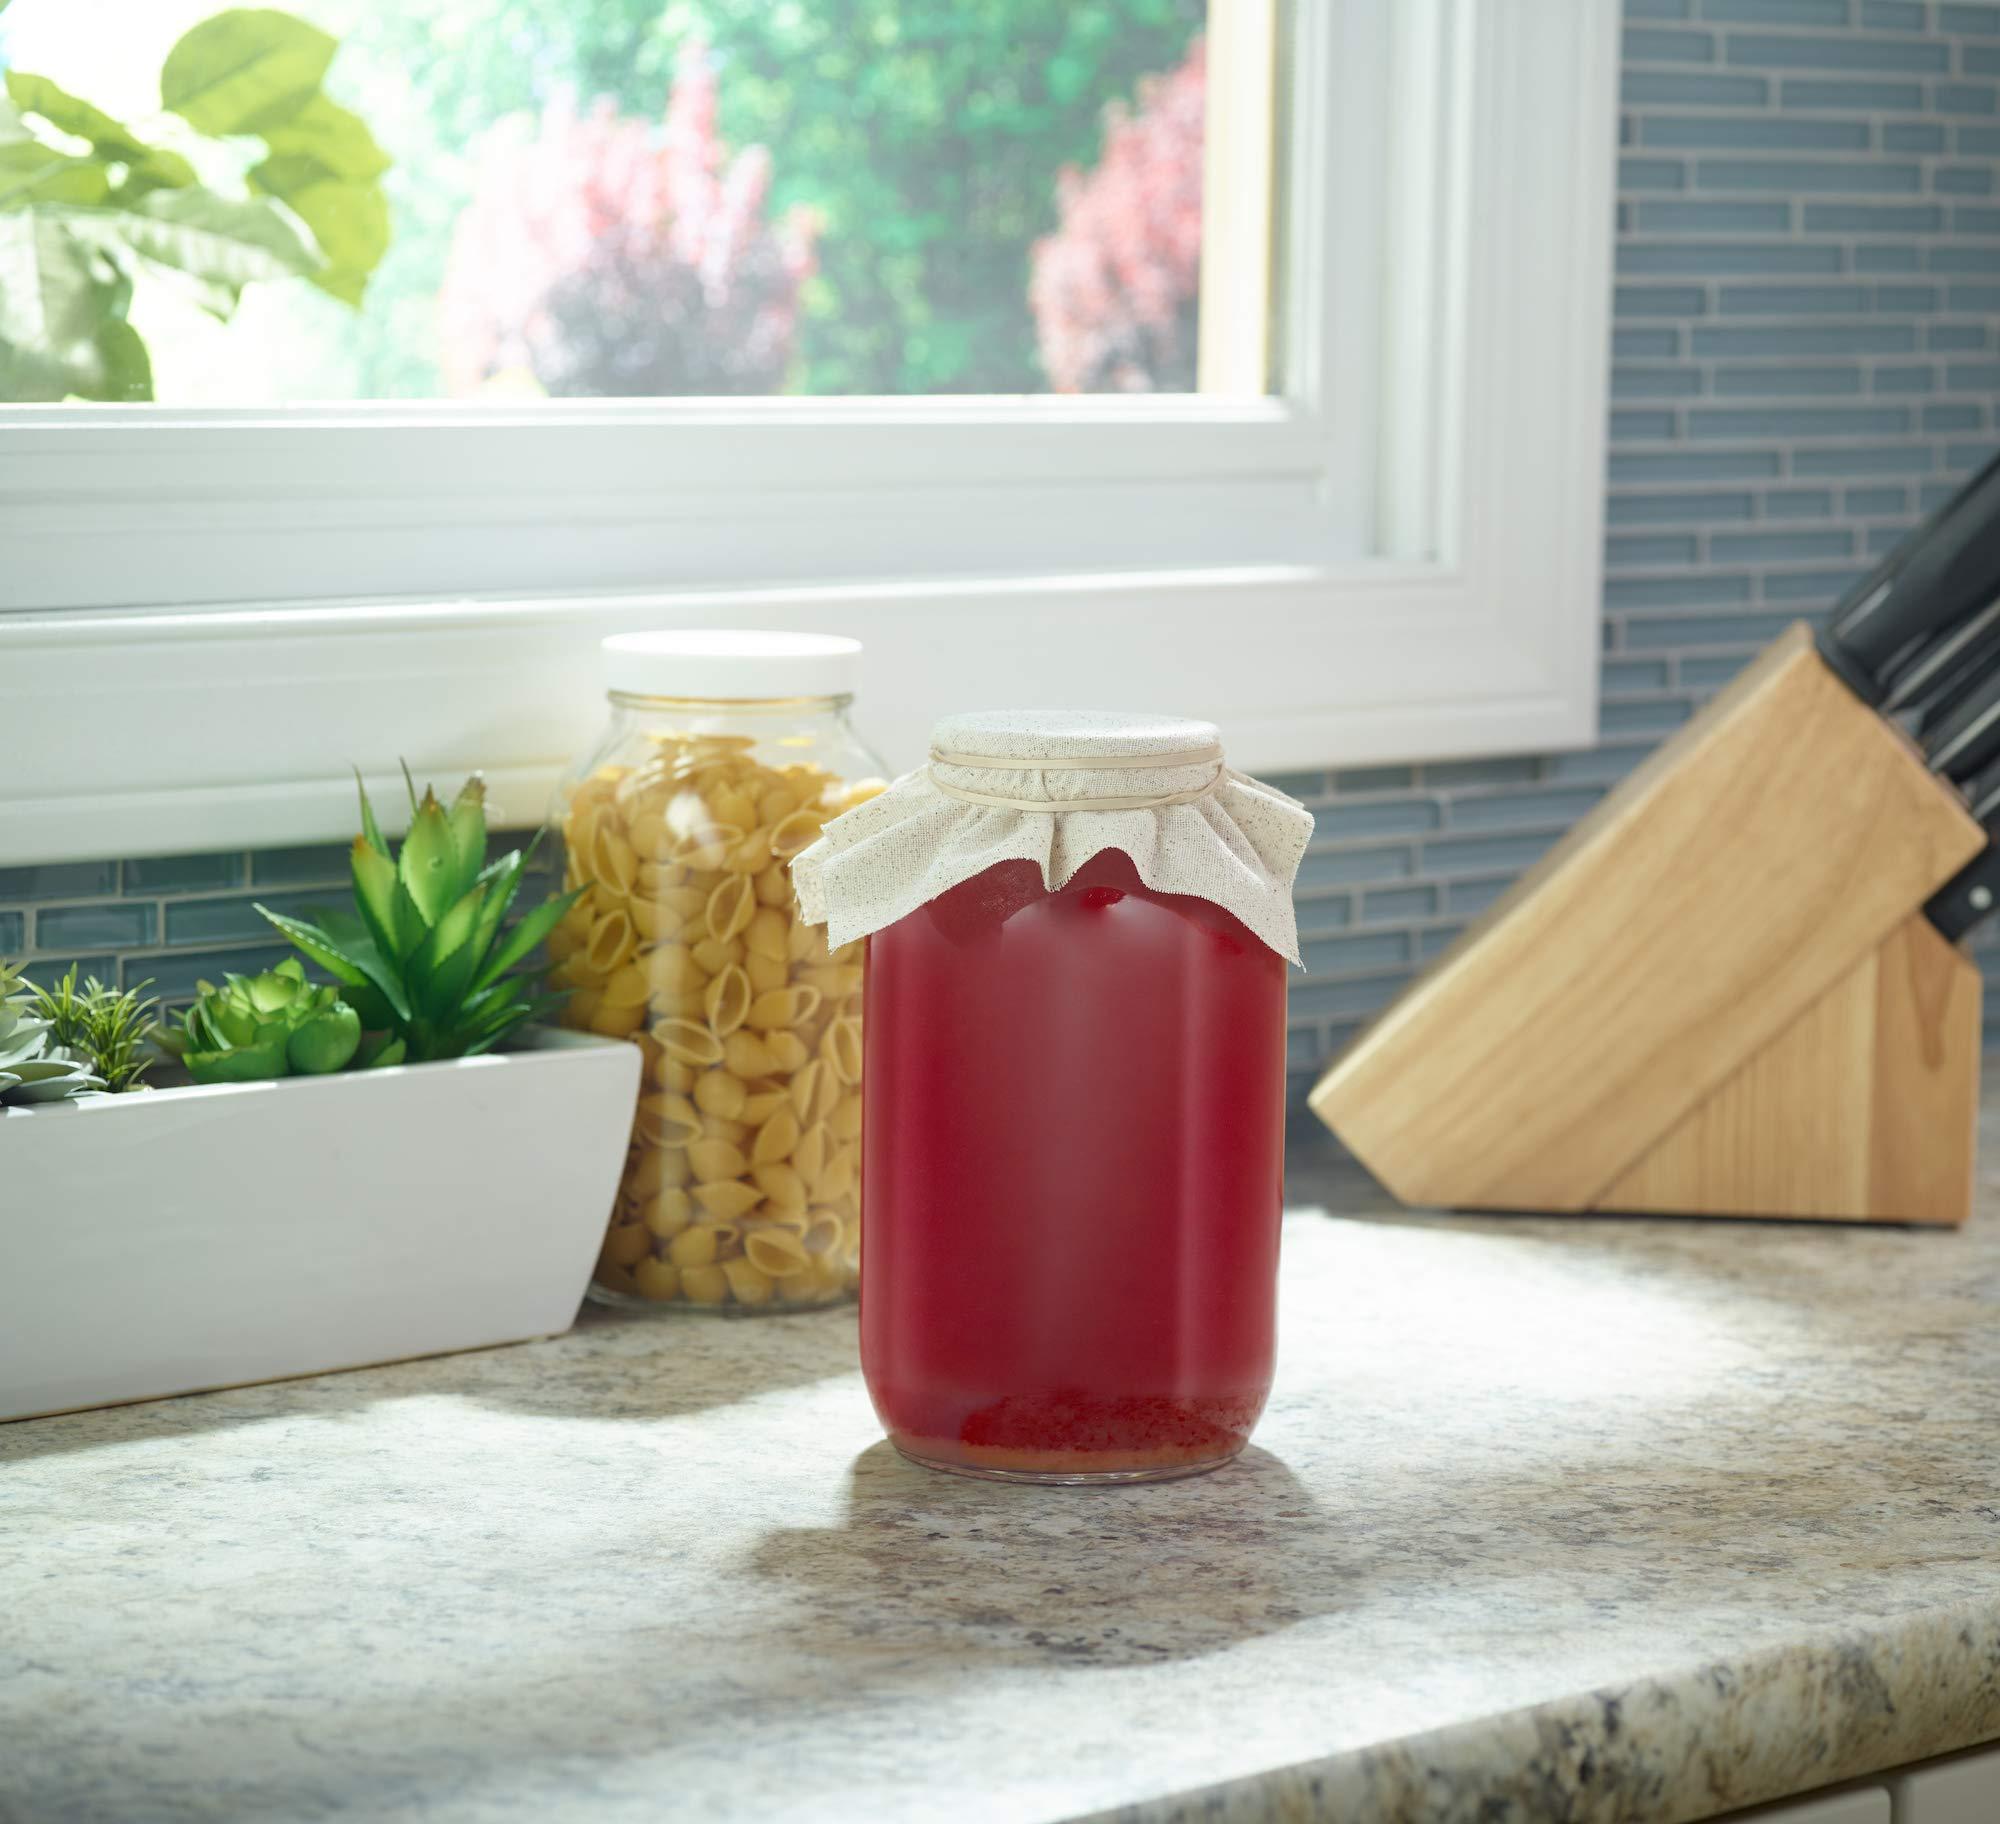 1790 Half Gallon Glass Jars (64oz) 2-Pack - Includes 2 Airtight Lids, Muslin Cloths, Rubber Bands - BPA Free, Dishwasher & Freezer Safe - Perfect for Kombucha, Kefir, Canning, Sun Tea, Fermentation by 1790 (Image #5)